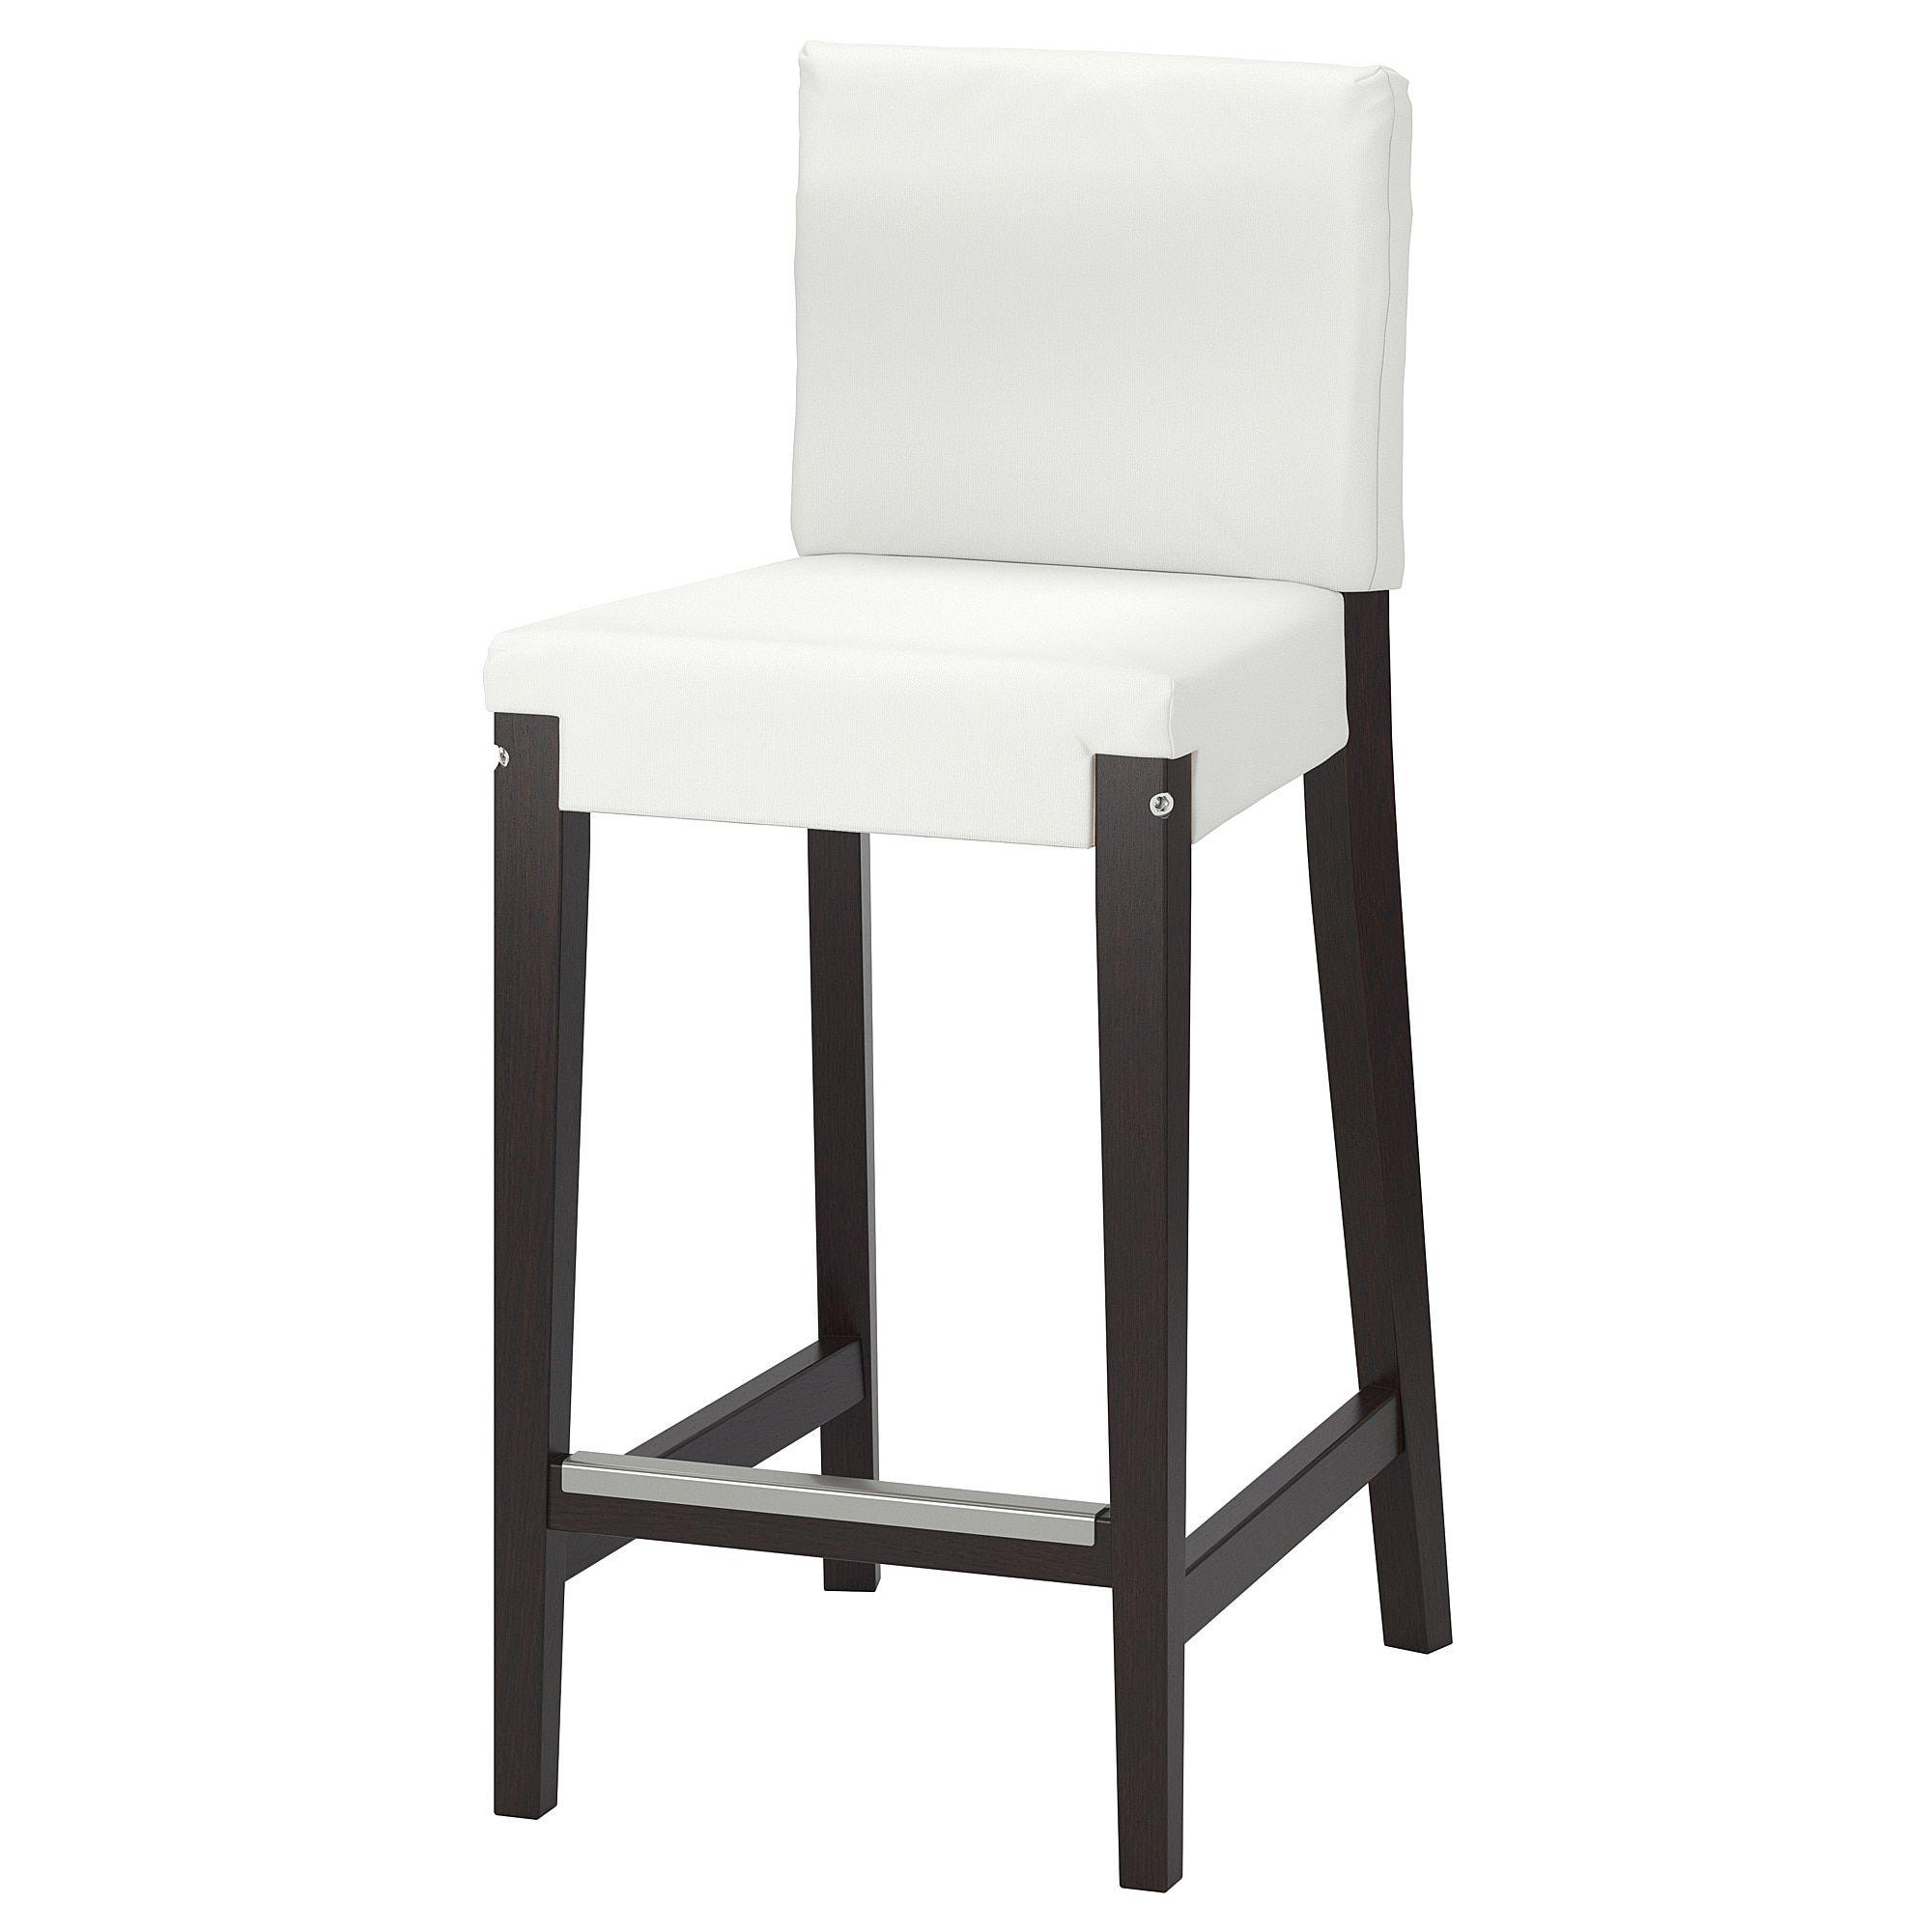 Ikea Henriksdal Dark Brown Bar Stool With Backrest Frame In 2019 Bar Stools Brown Bar Stools Stool